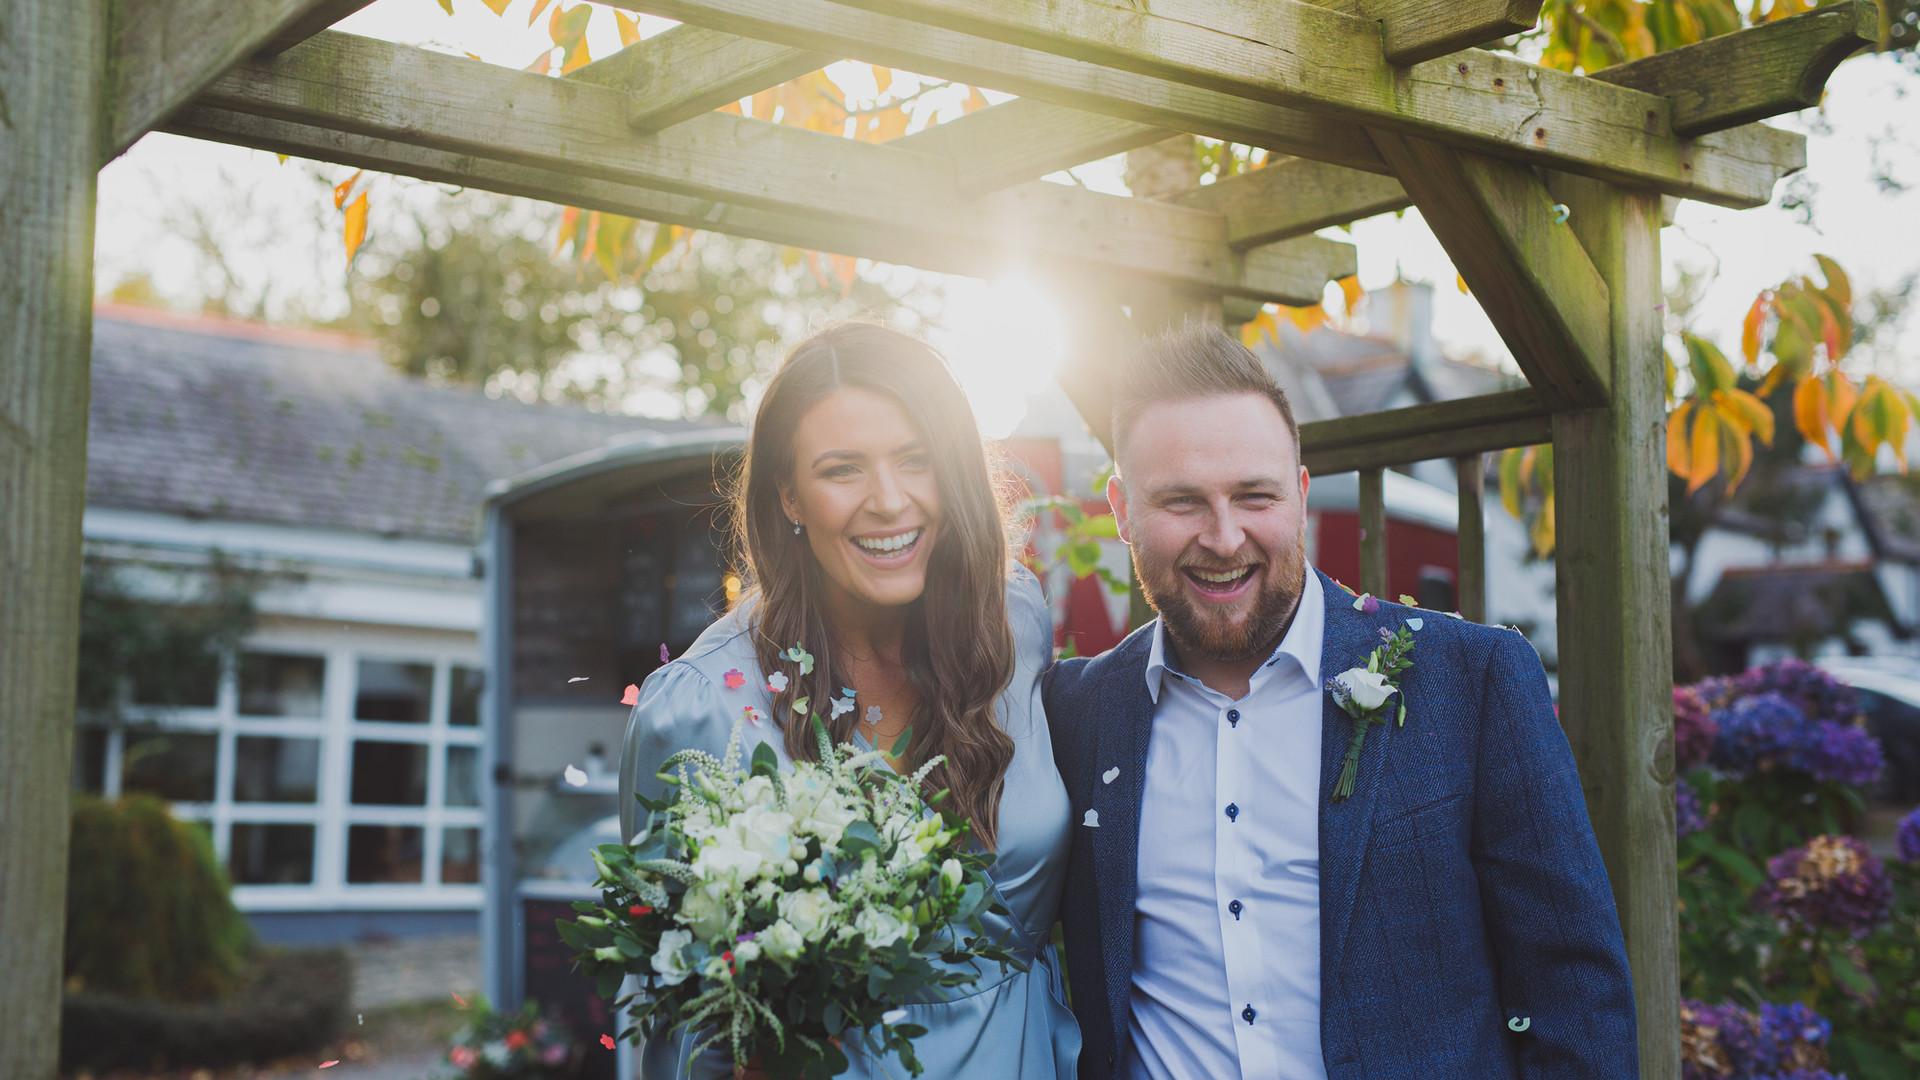 Northern Ireland Lockdown Wedding   Maddypenny Farm Wedding   Living Witness Weddings